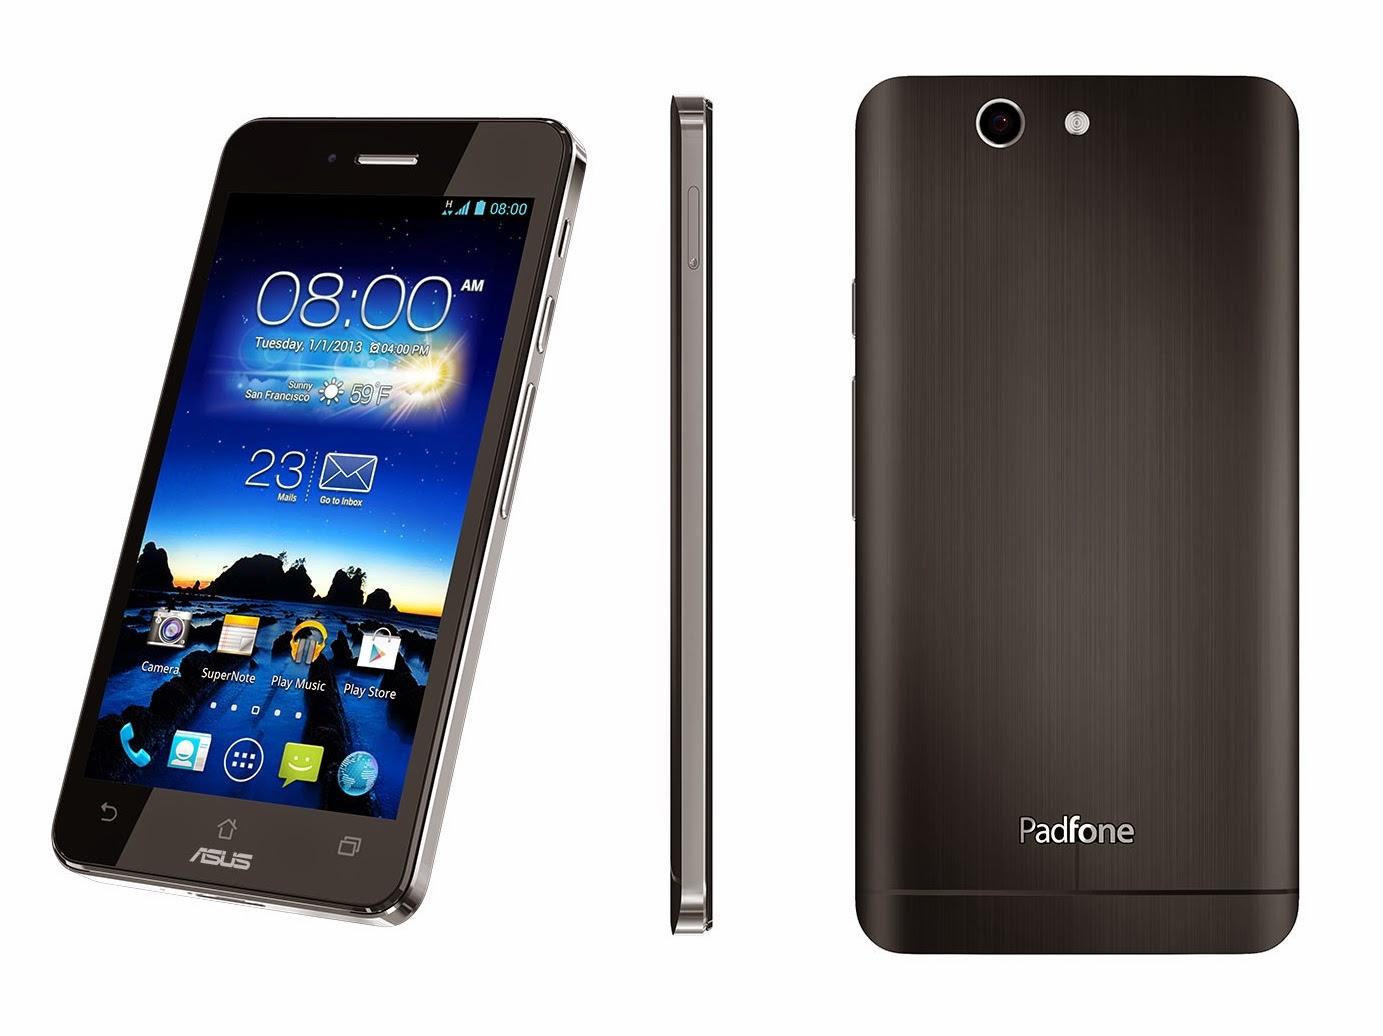 jual online aksesoris handphone sony murah lazada hnczcyw